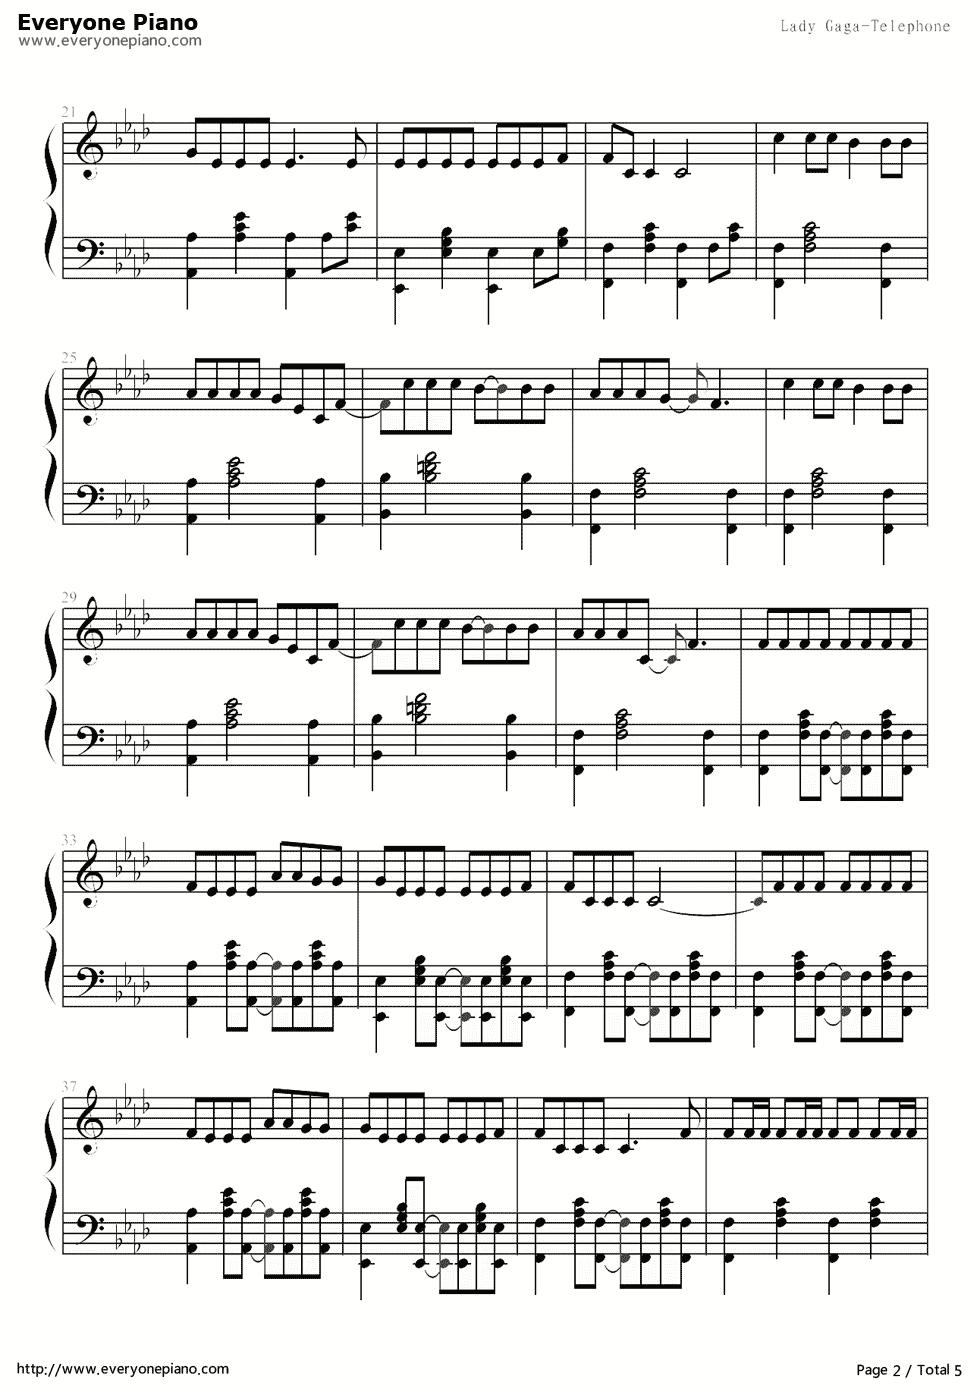 Telephone电话-Lady嘎嘎Lady GaGa五线谱预览2-钢琴谱文件